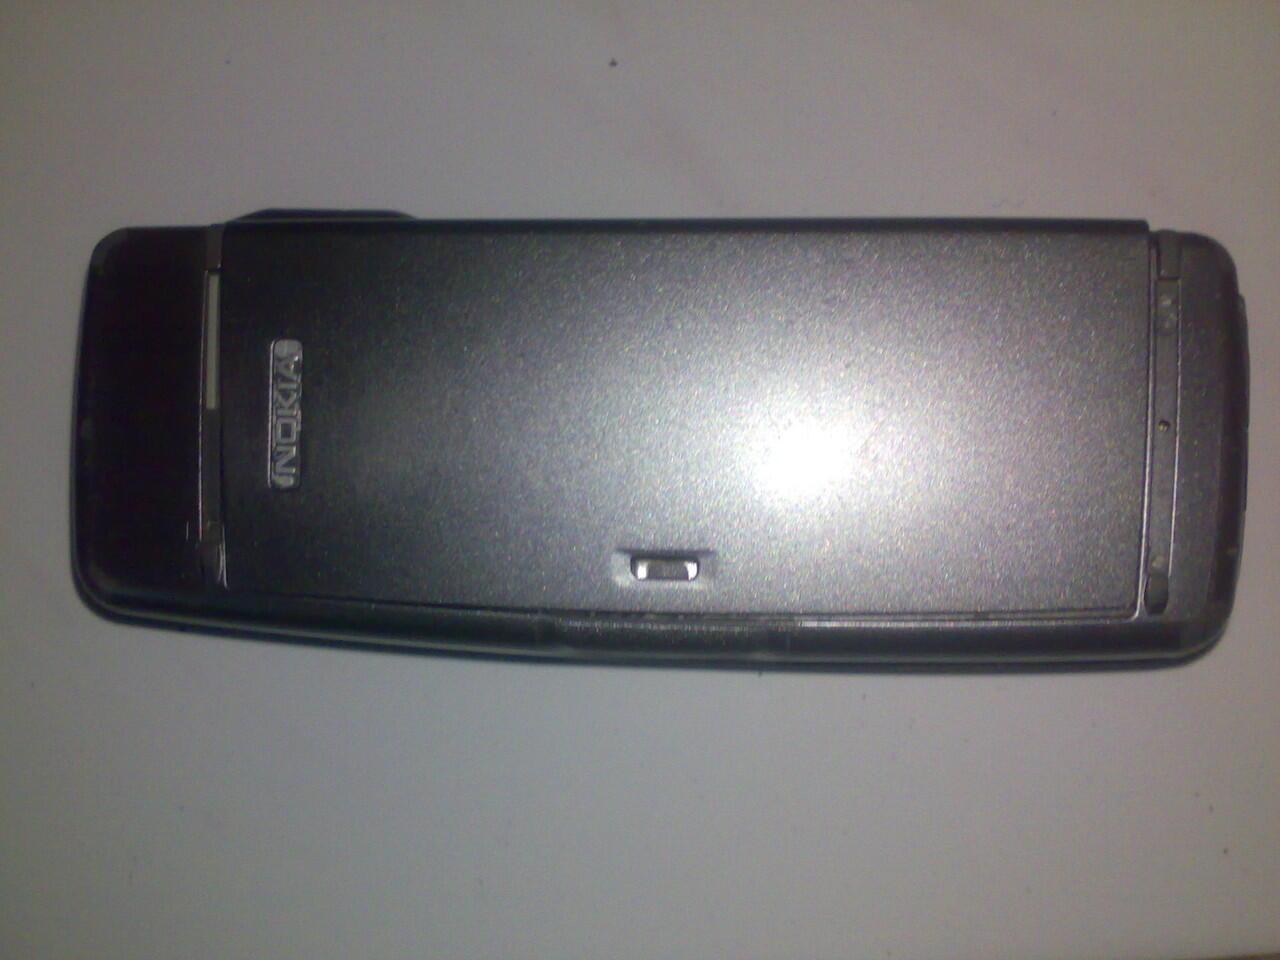 9300i comunicator wifi fullset